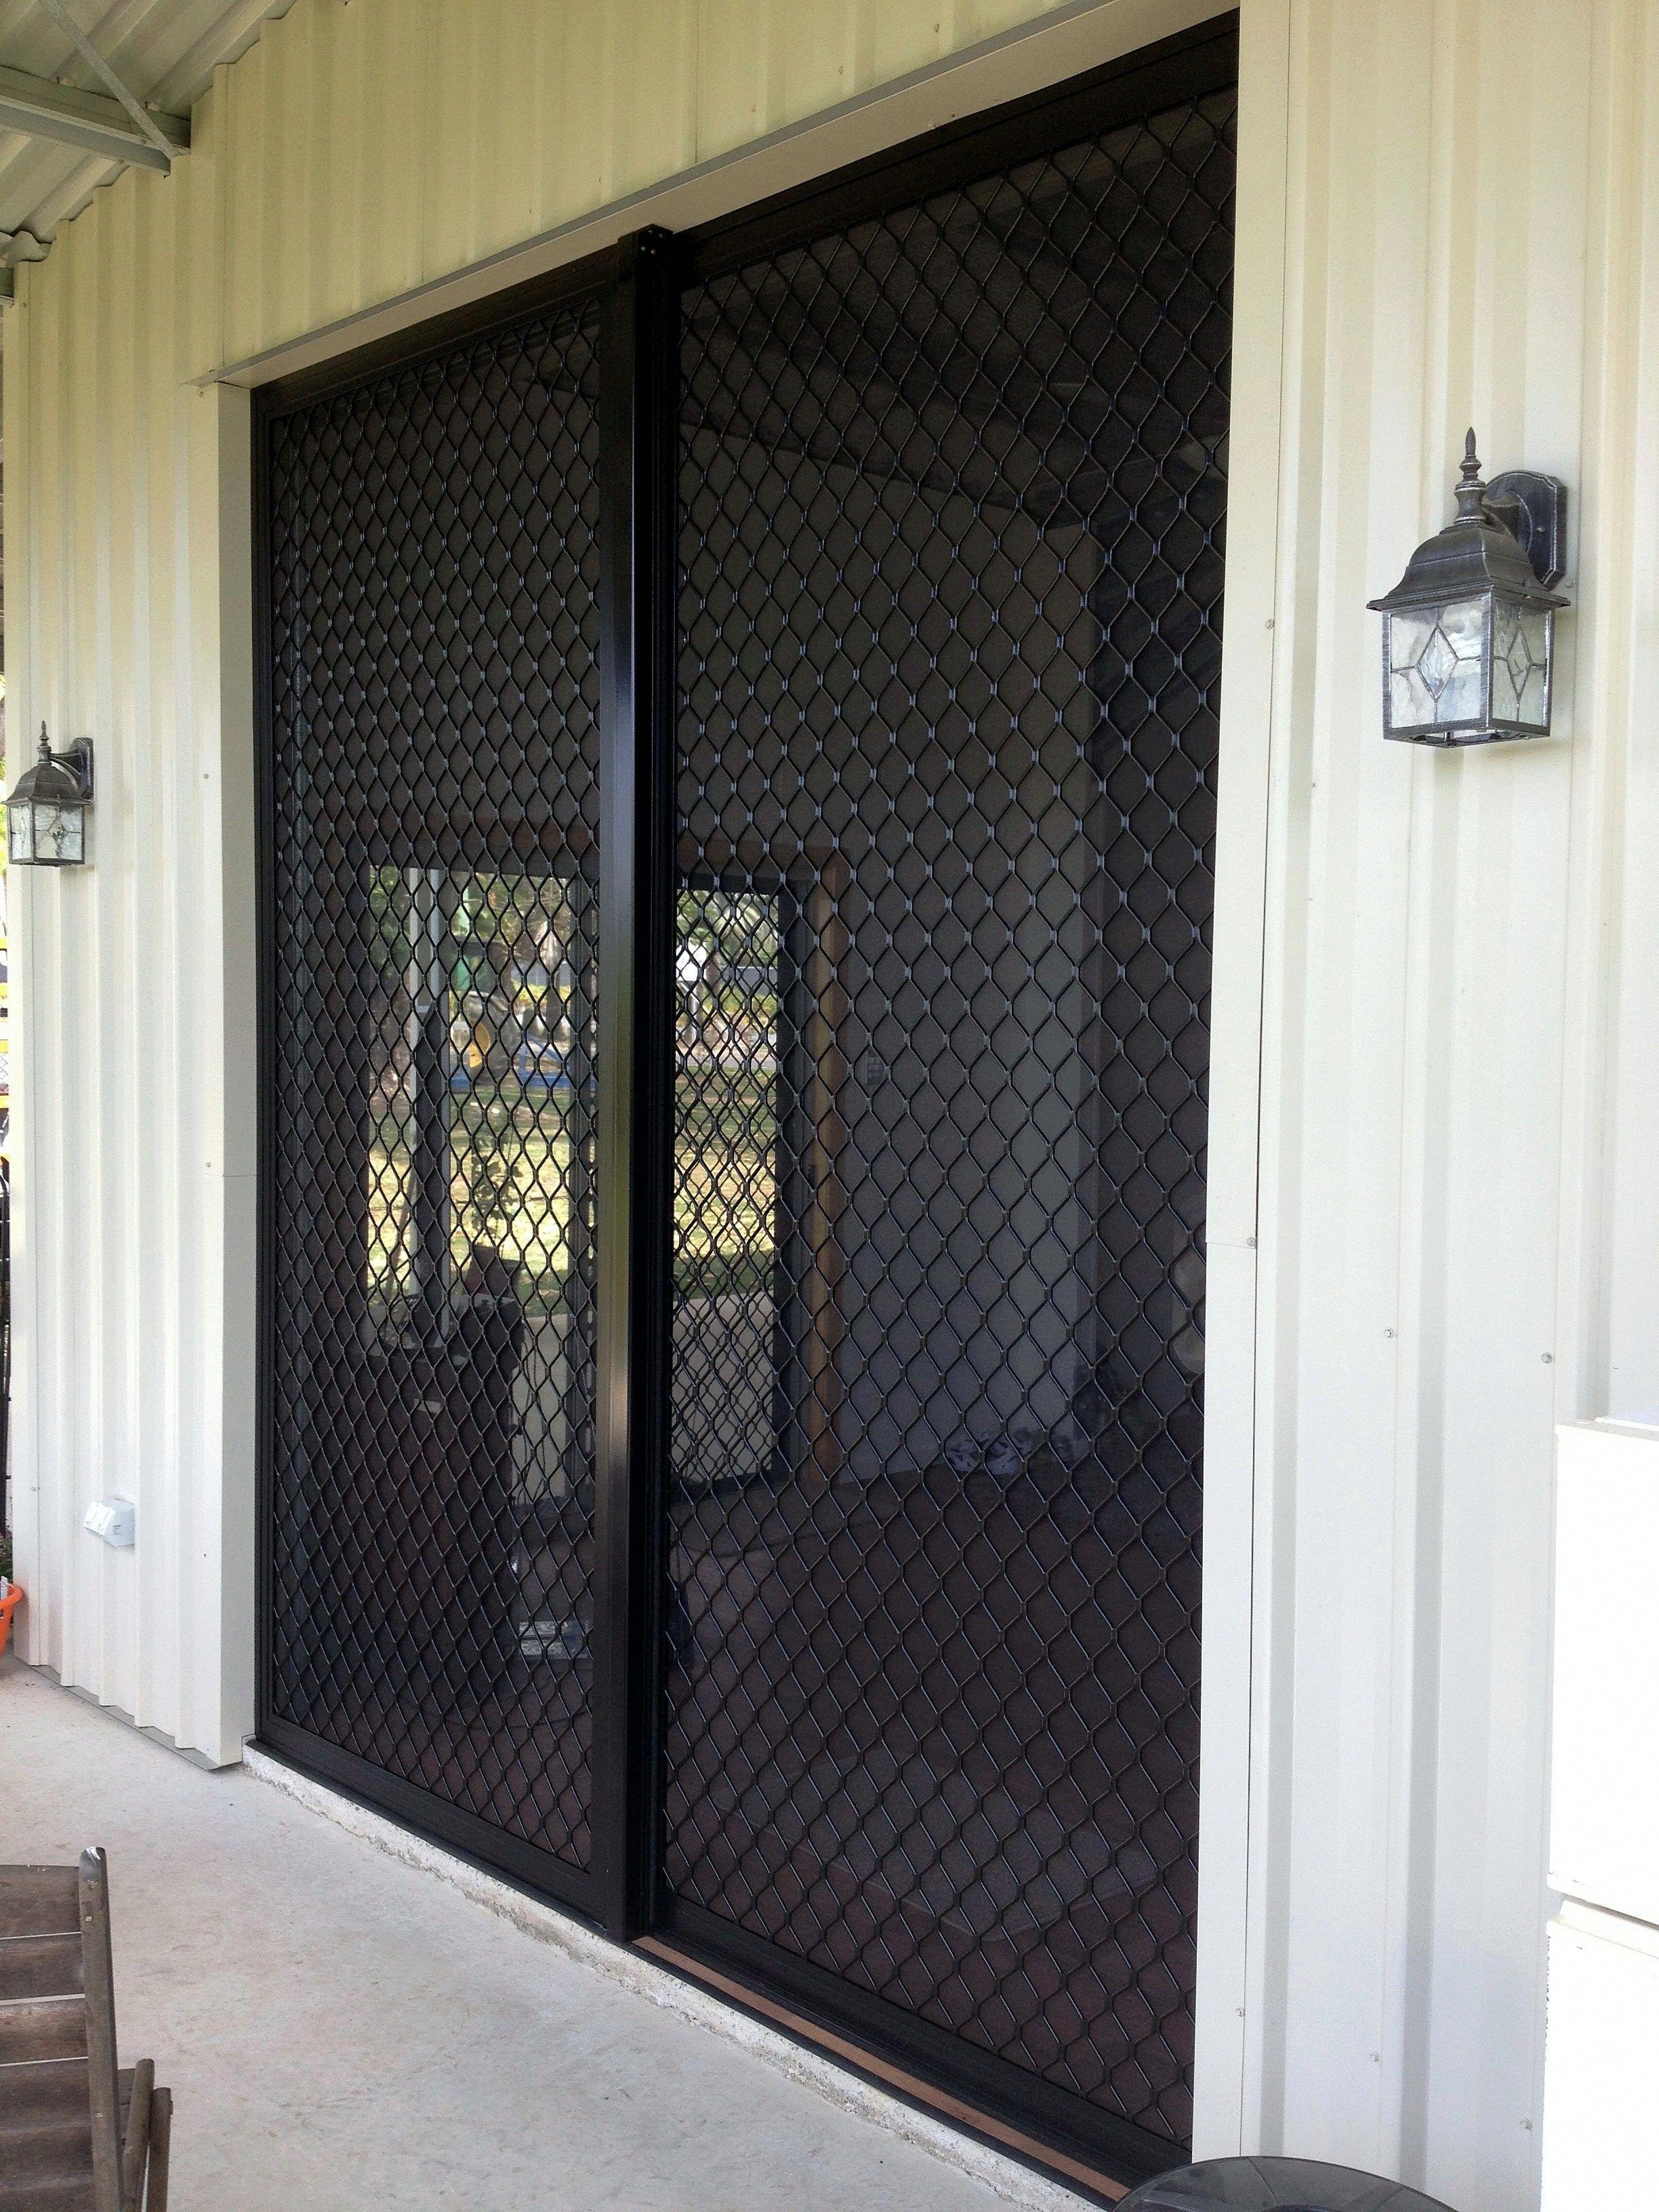 Sliding Security Screen Doors Security Screen Door Home Security Security Screen